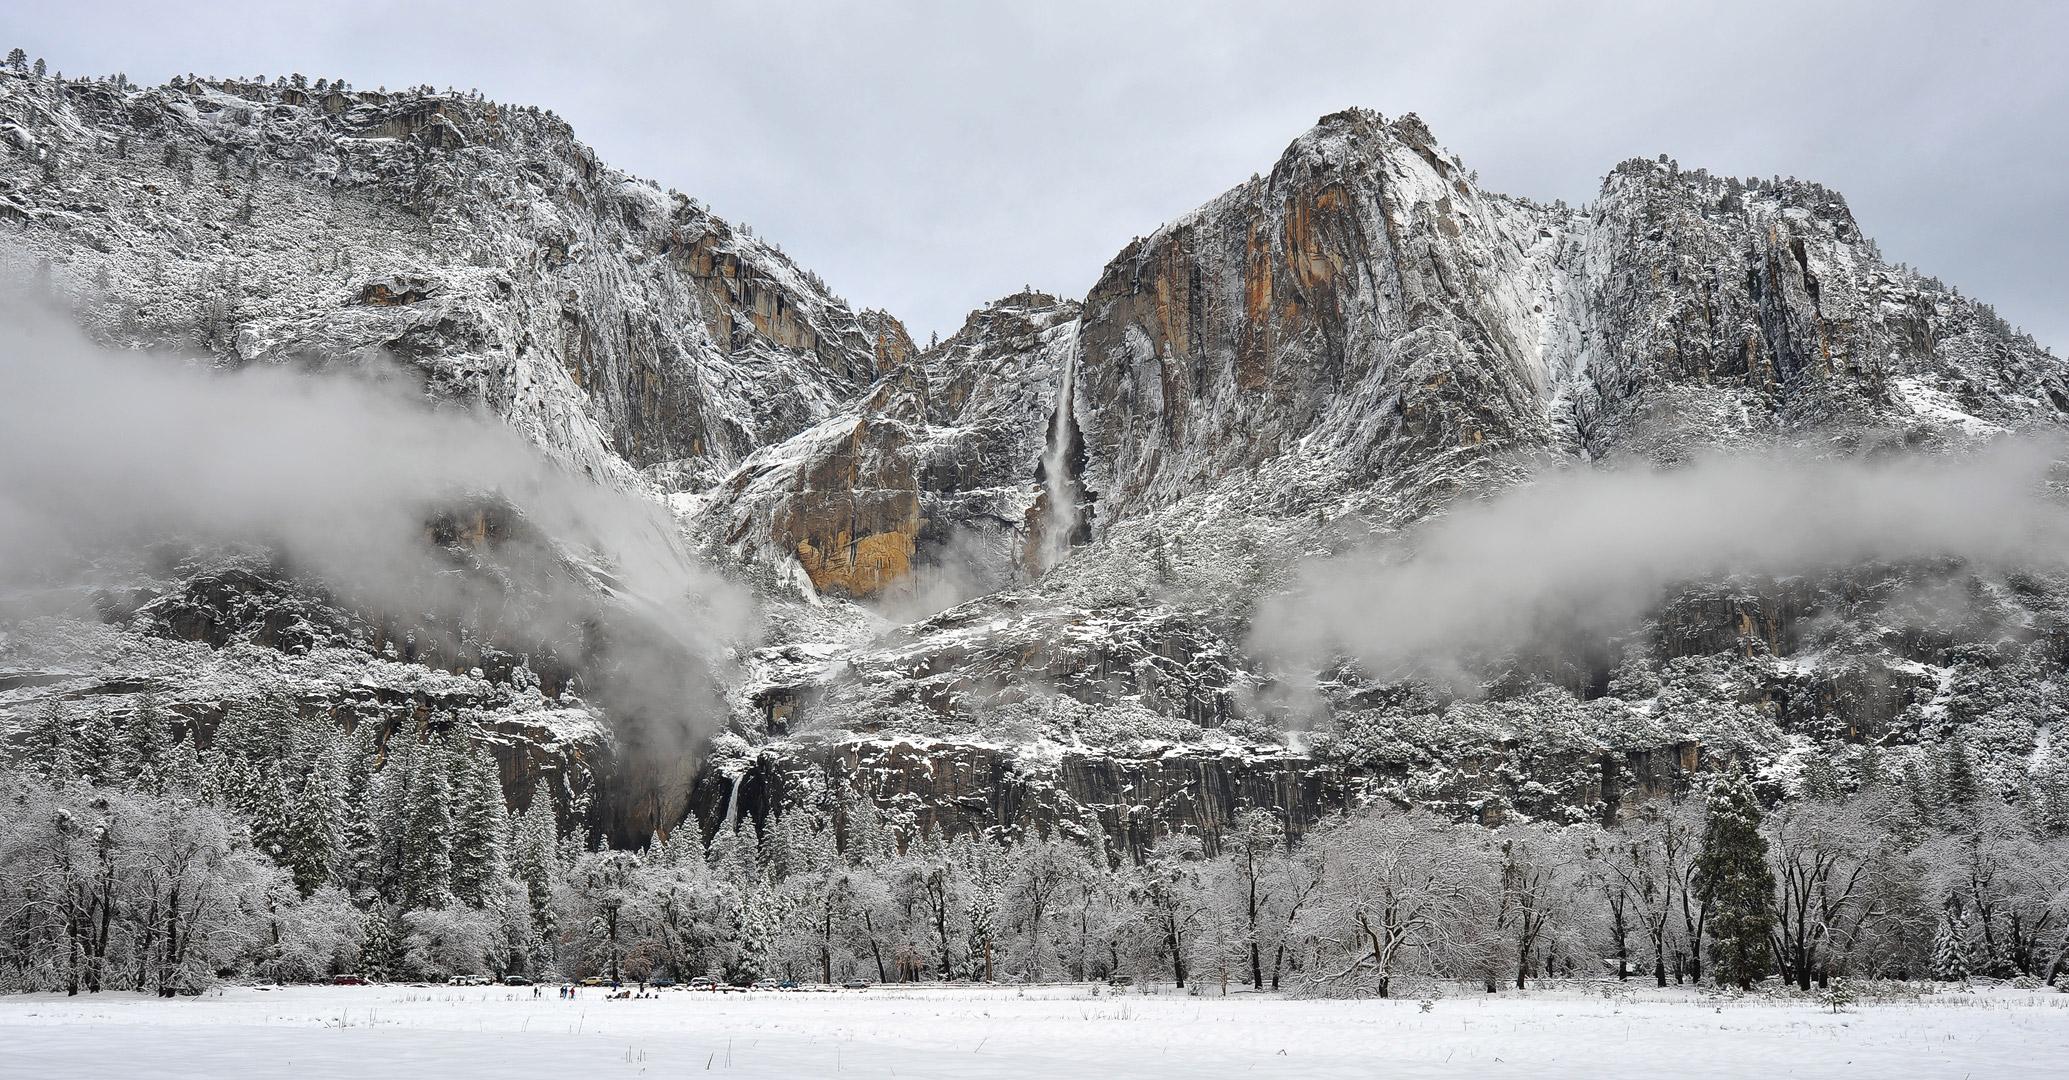 Yosemite, National Park, California, Winter, Landscape, Snow, Mountains, Waterfalls, Rivers, Vista, Iconic, Bridalveil Fall...